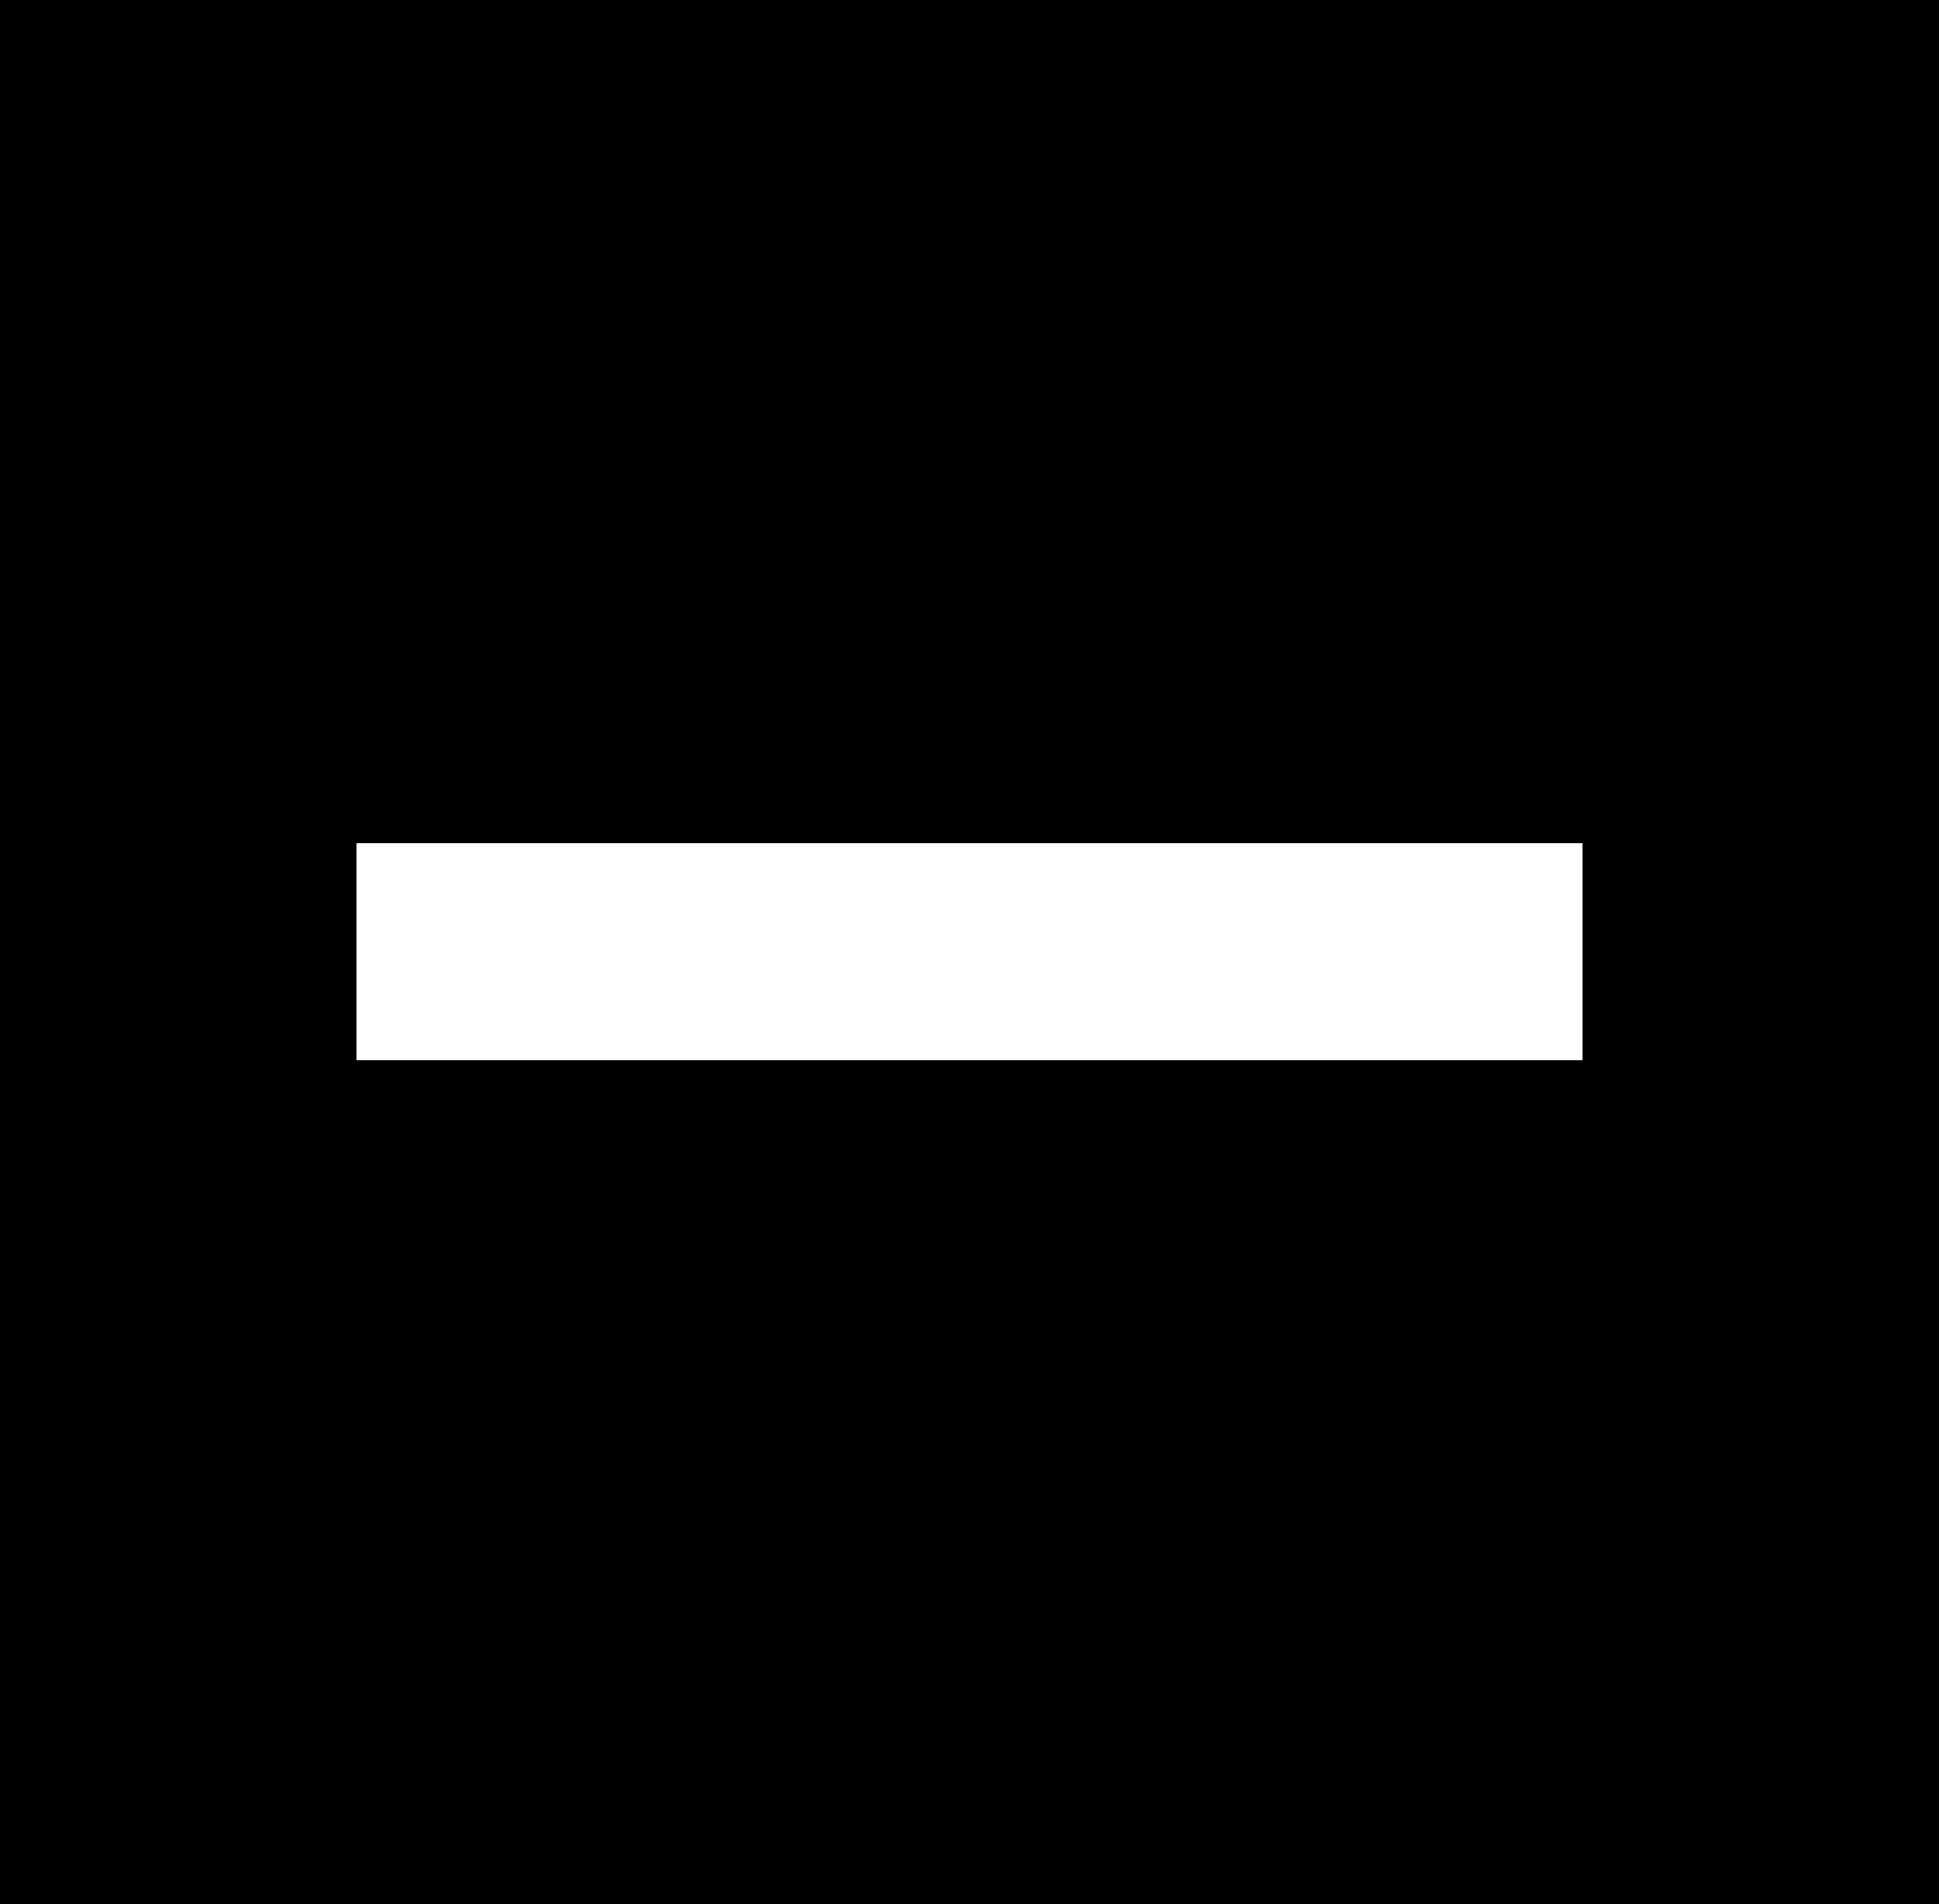 airwaav